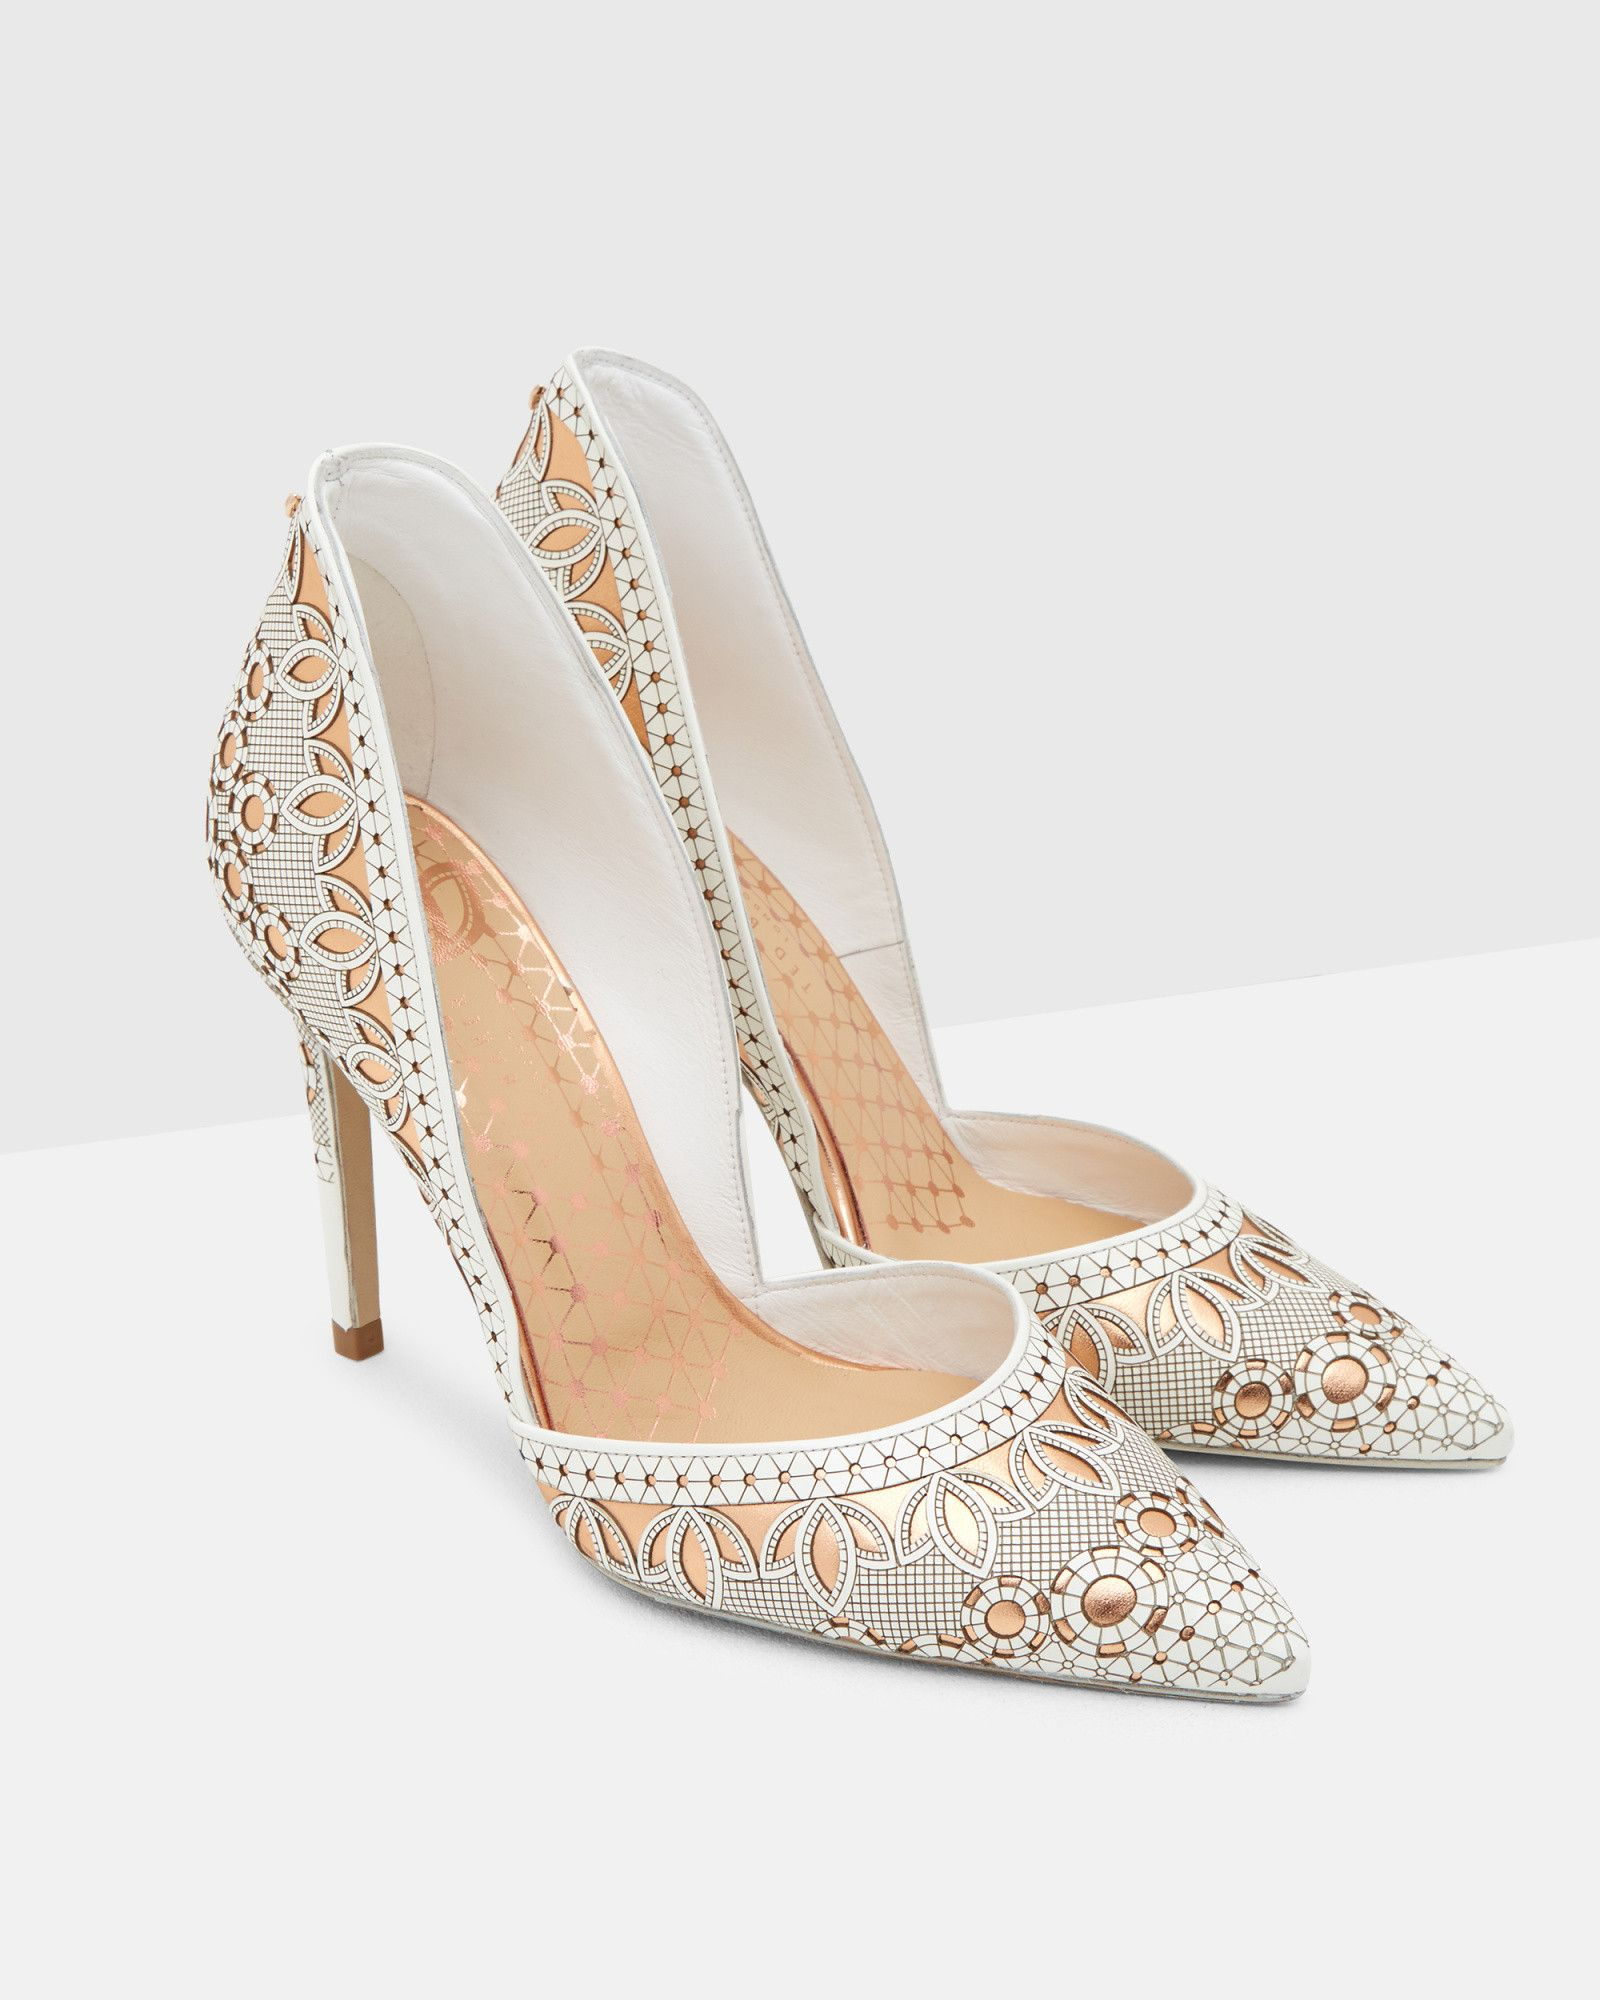 ff9159efbb0 Lazer cut leather heeled courts - White